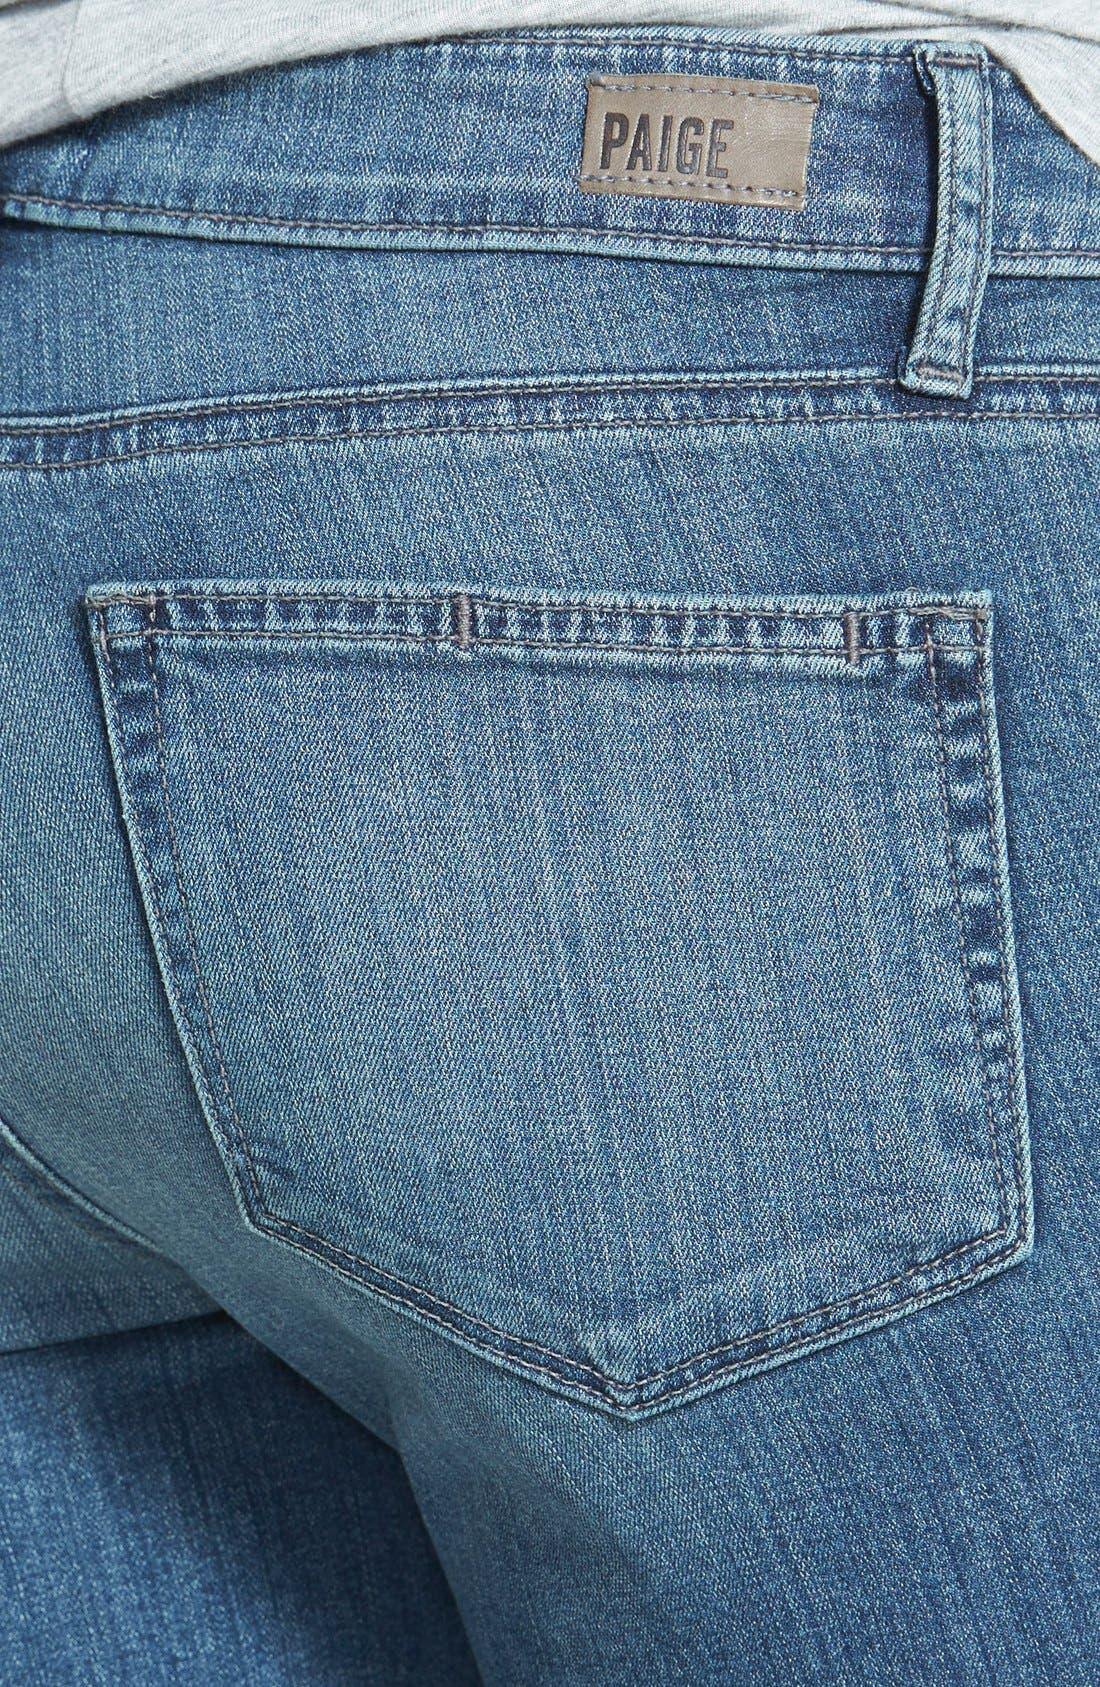 Alternate Image 3  - Paige Denim 'Verdugo' Low Rise Ankle Skinny Jeans (Dazeley)